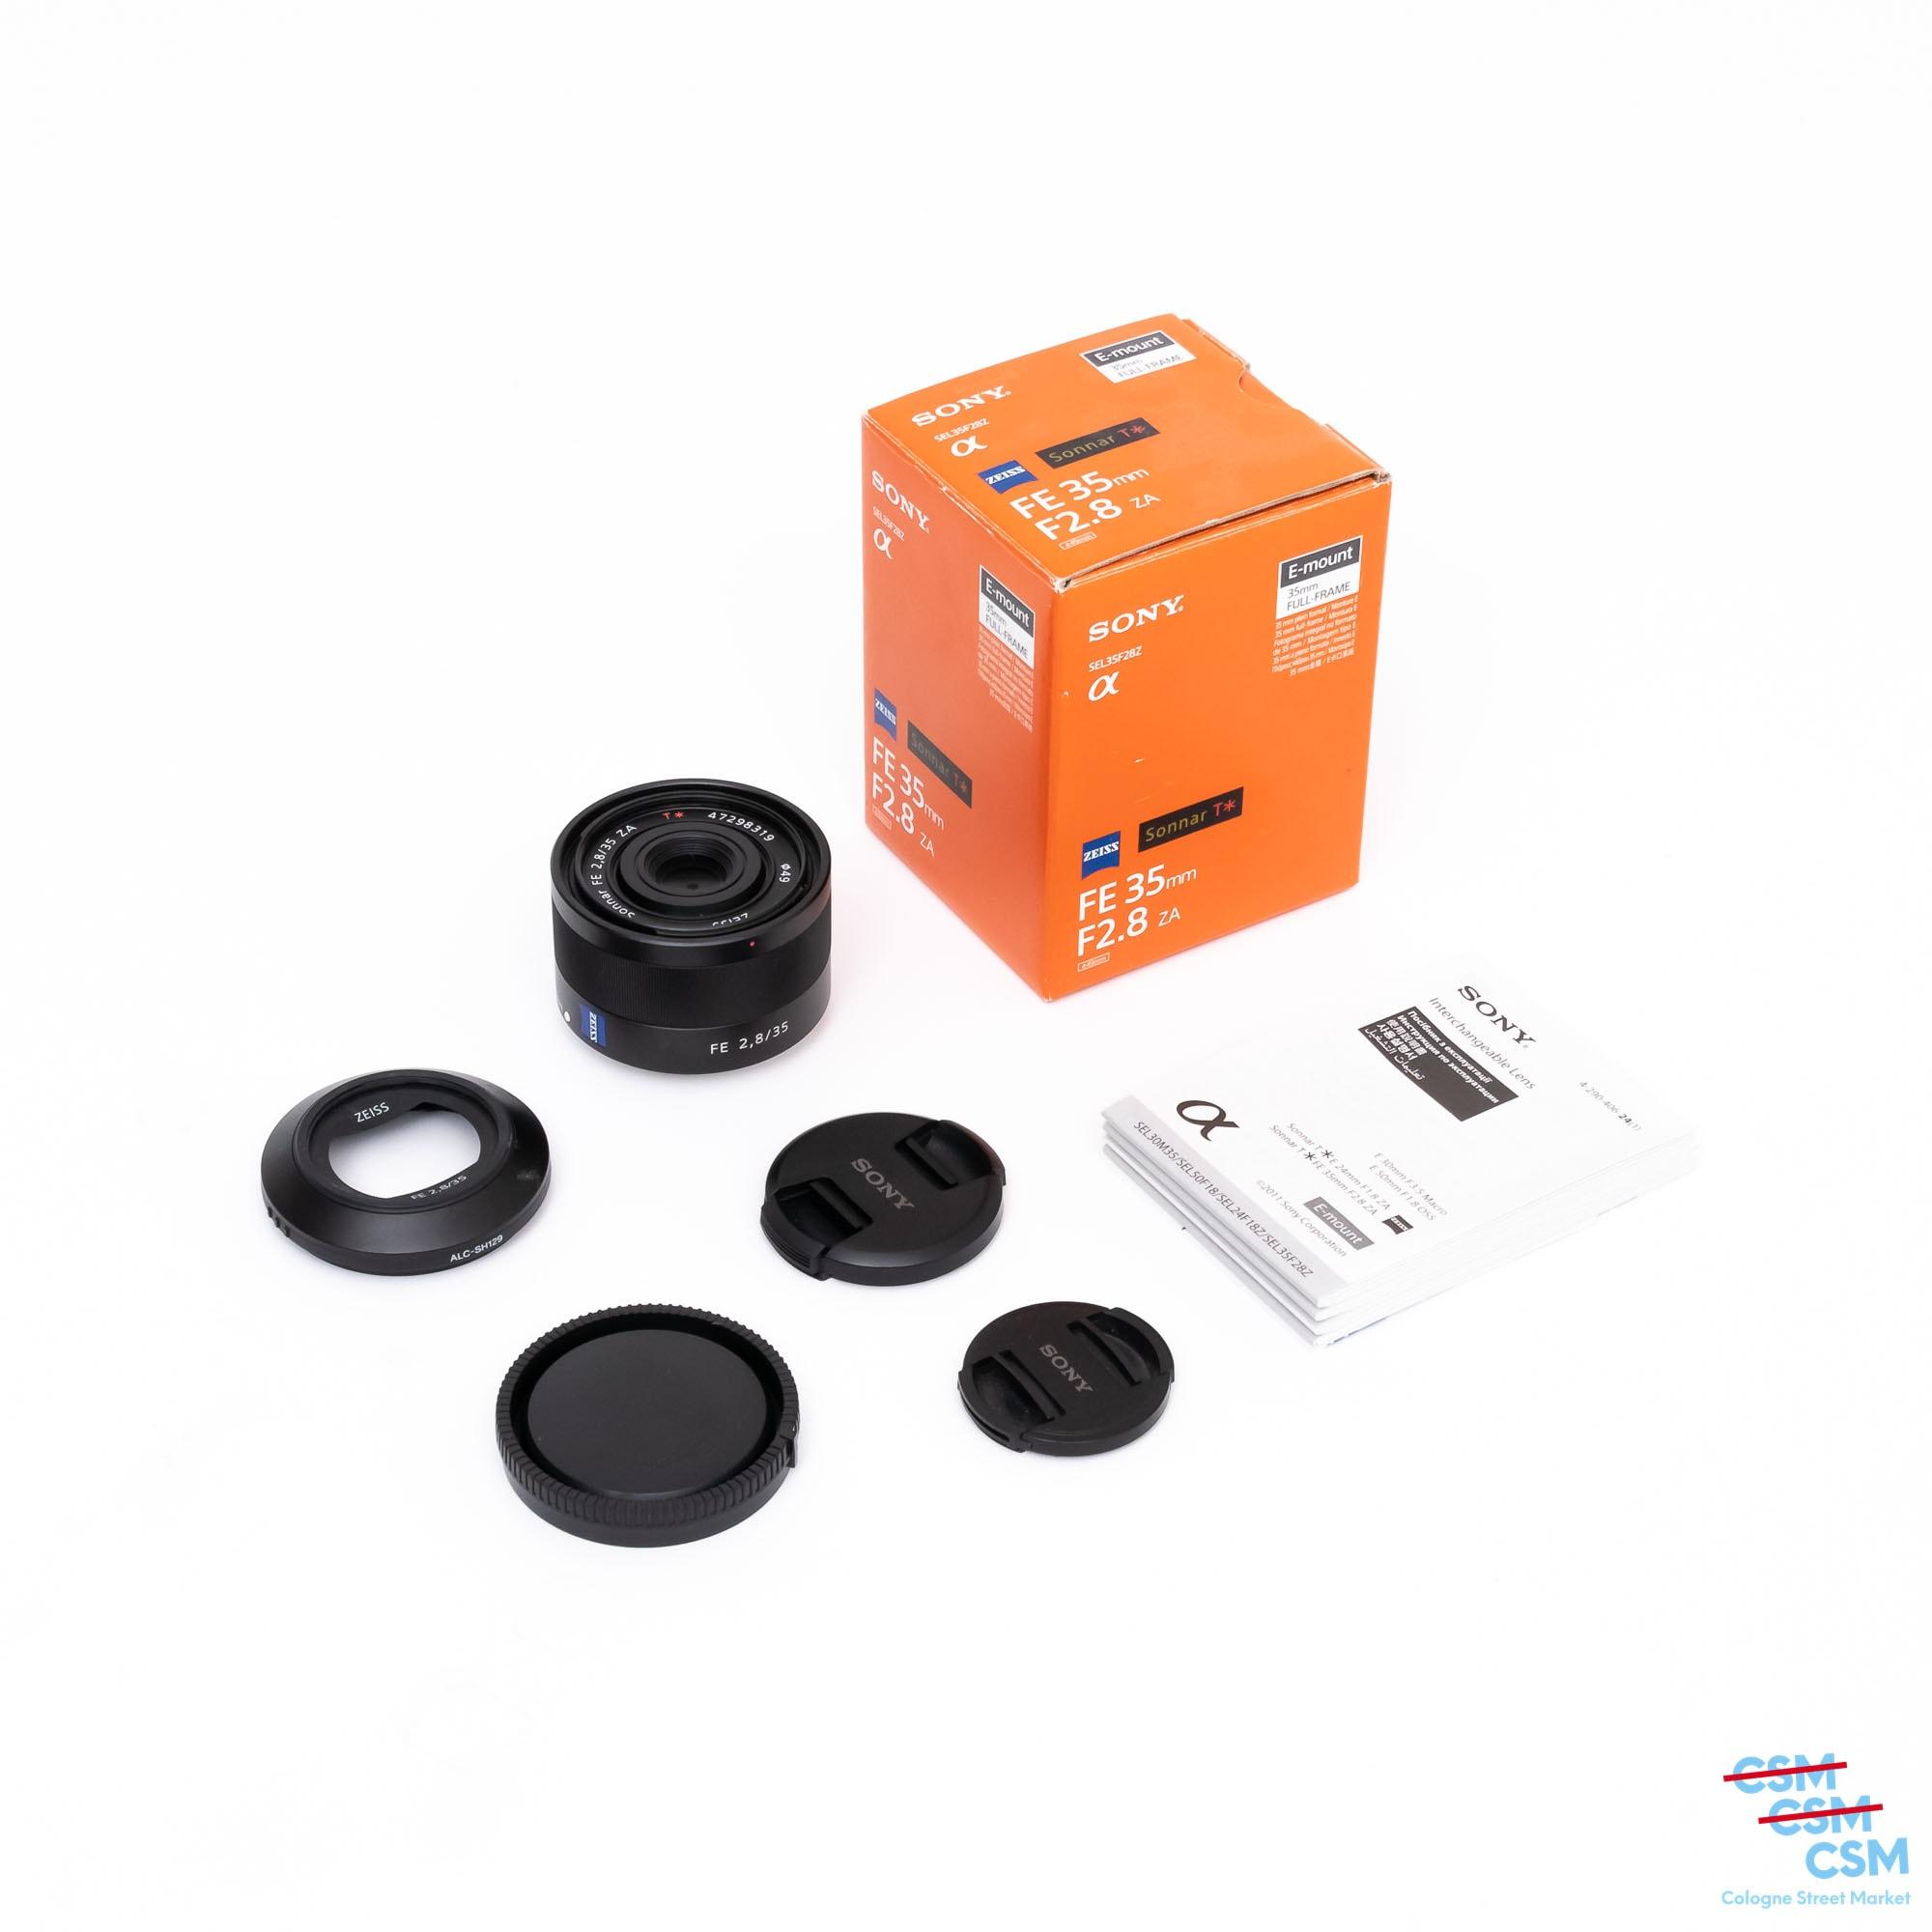 Sony-Sonnar-T-FE-35mm-f2.8-Zeiss-gebraucht-7